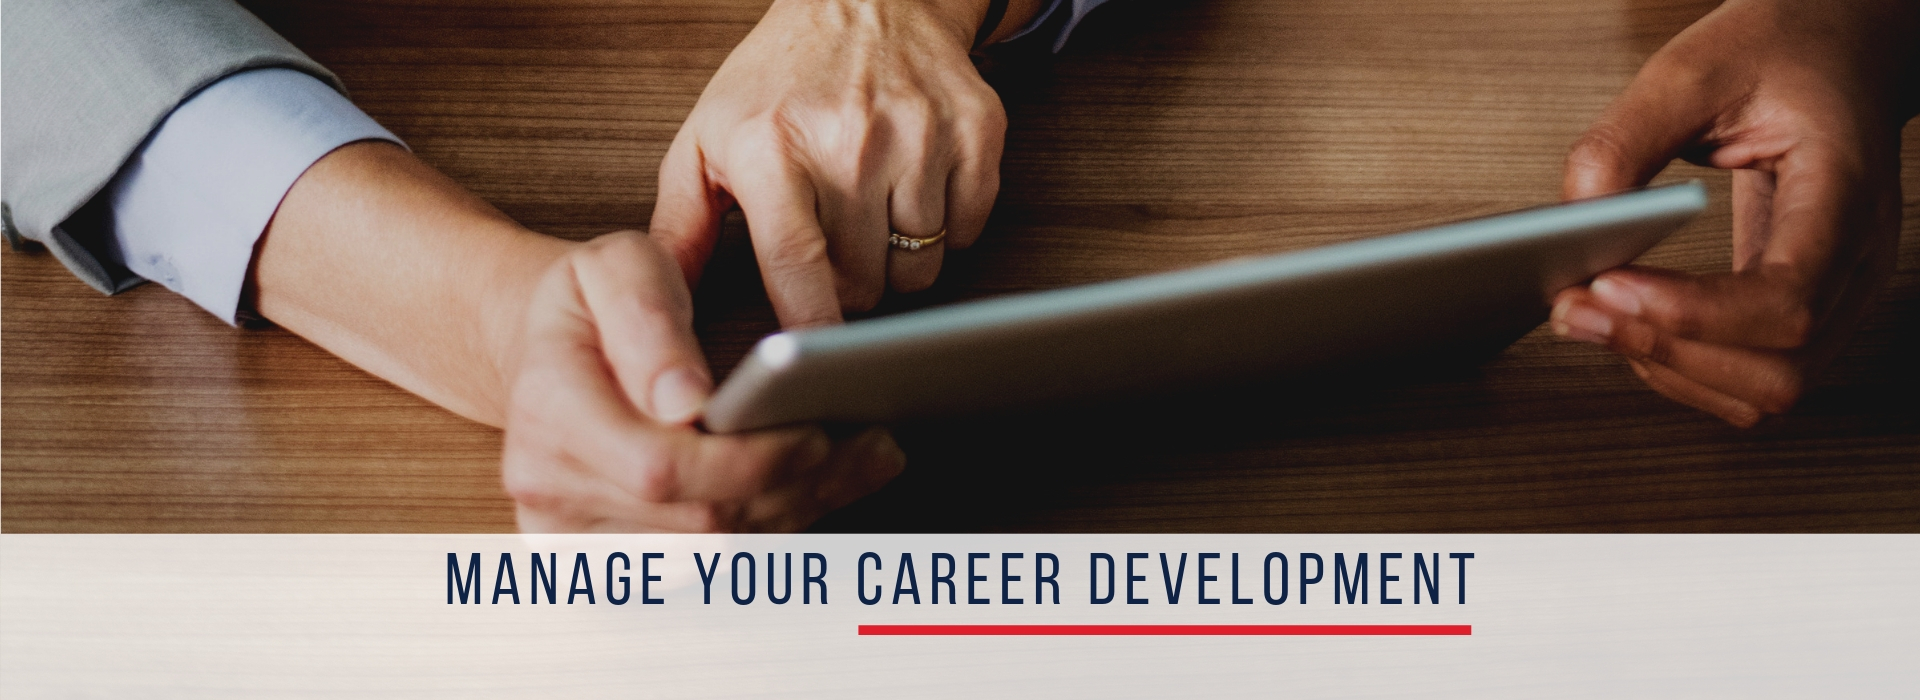 career management programs